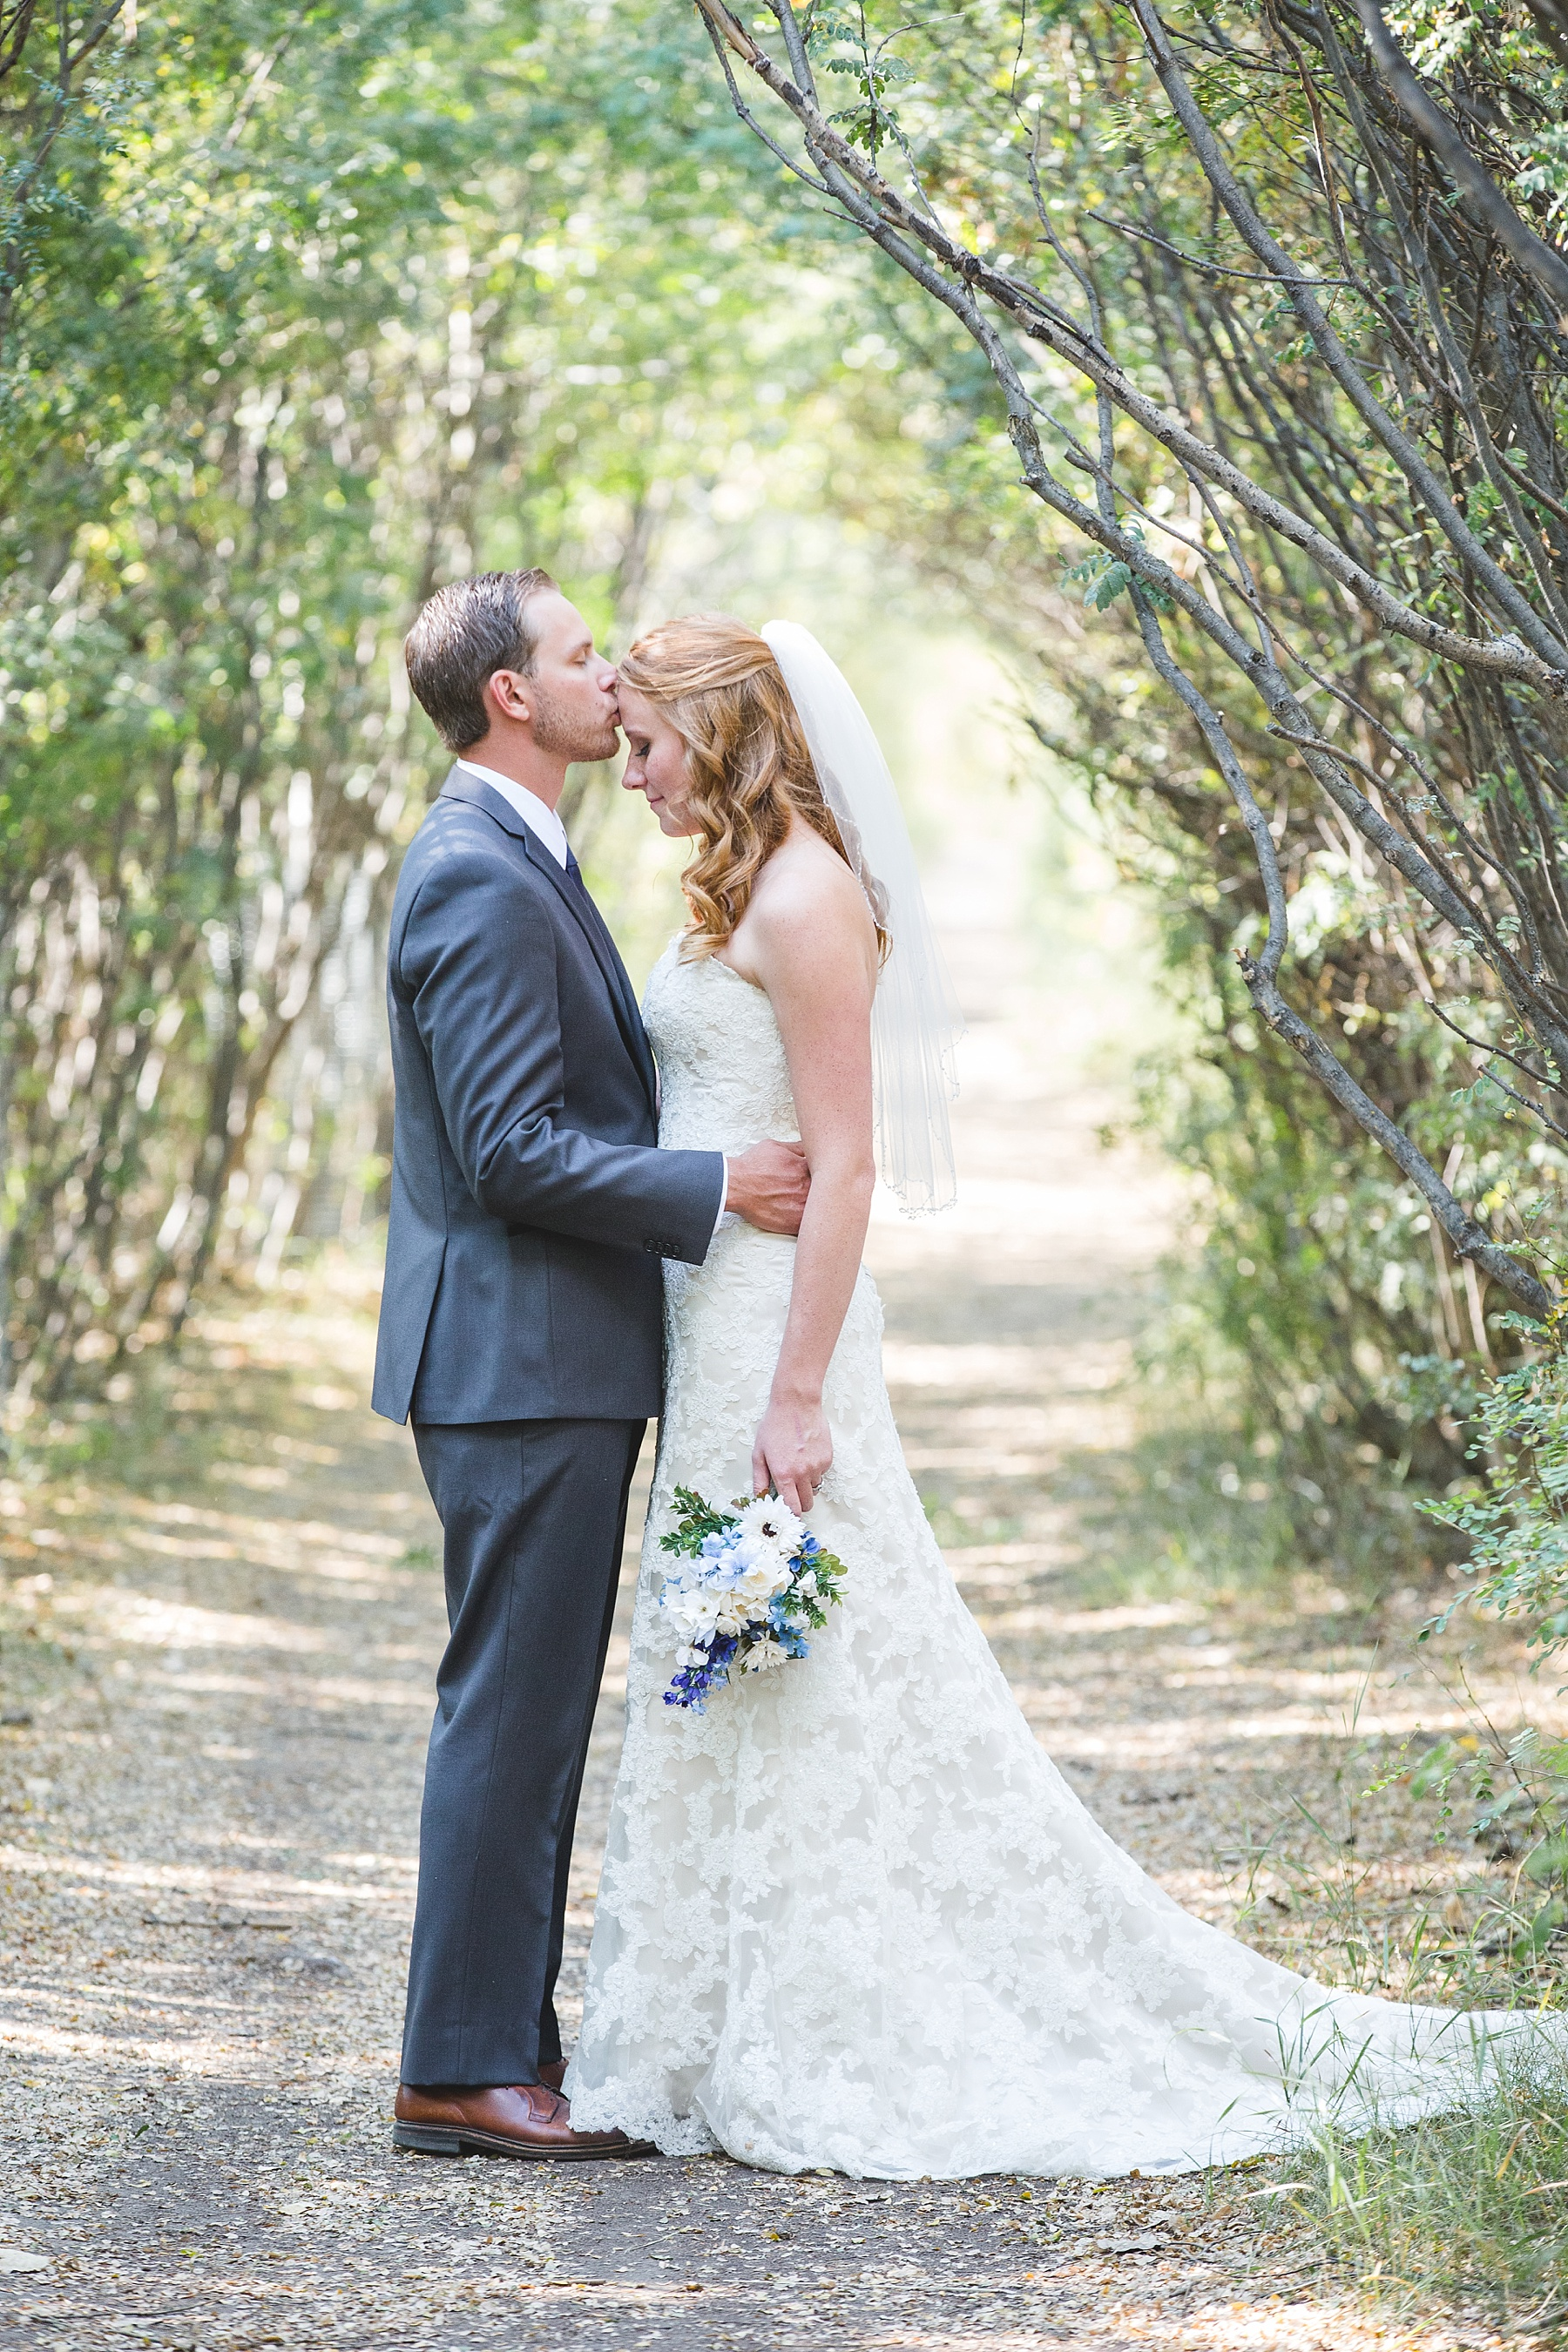 Edworthy Park Wedding Photography